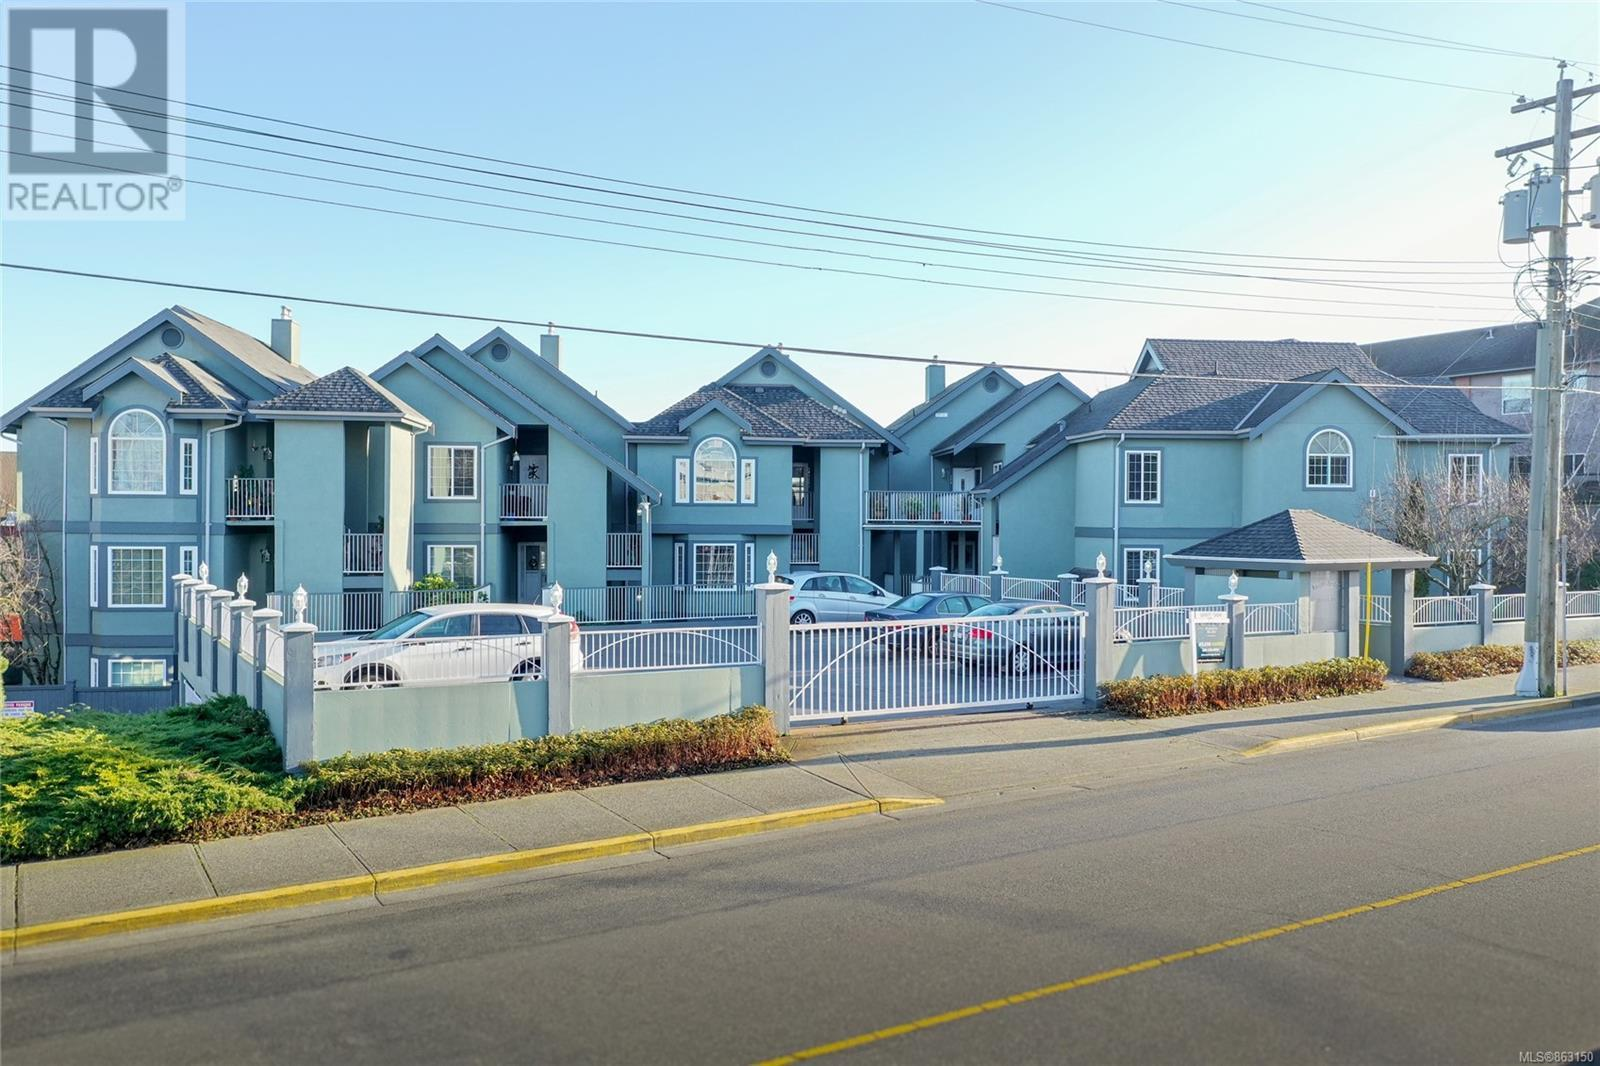 203 320 Selby St, Nanaimo, British Columbia  V9R 2R5 - Photo 1 - 863150